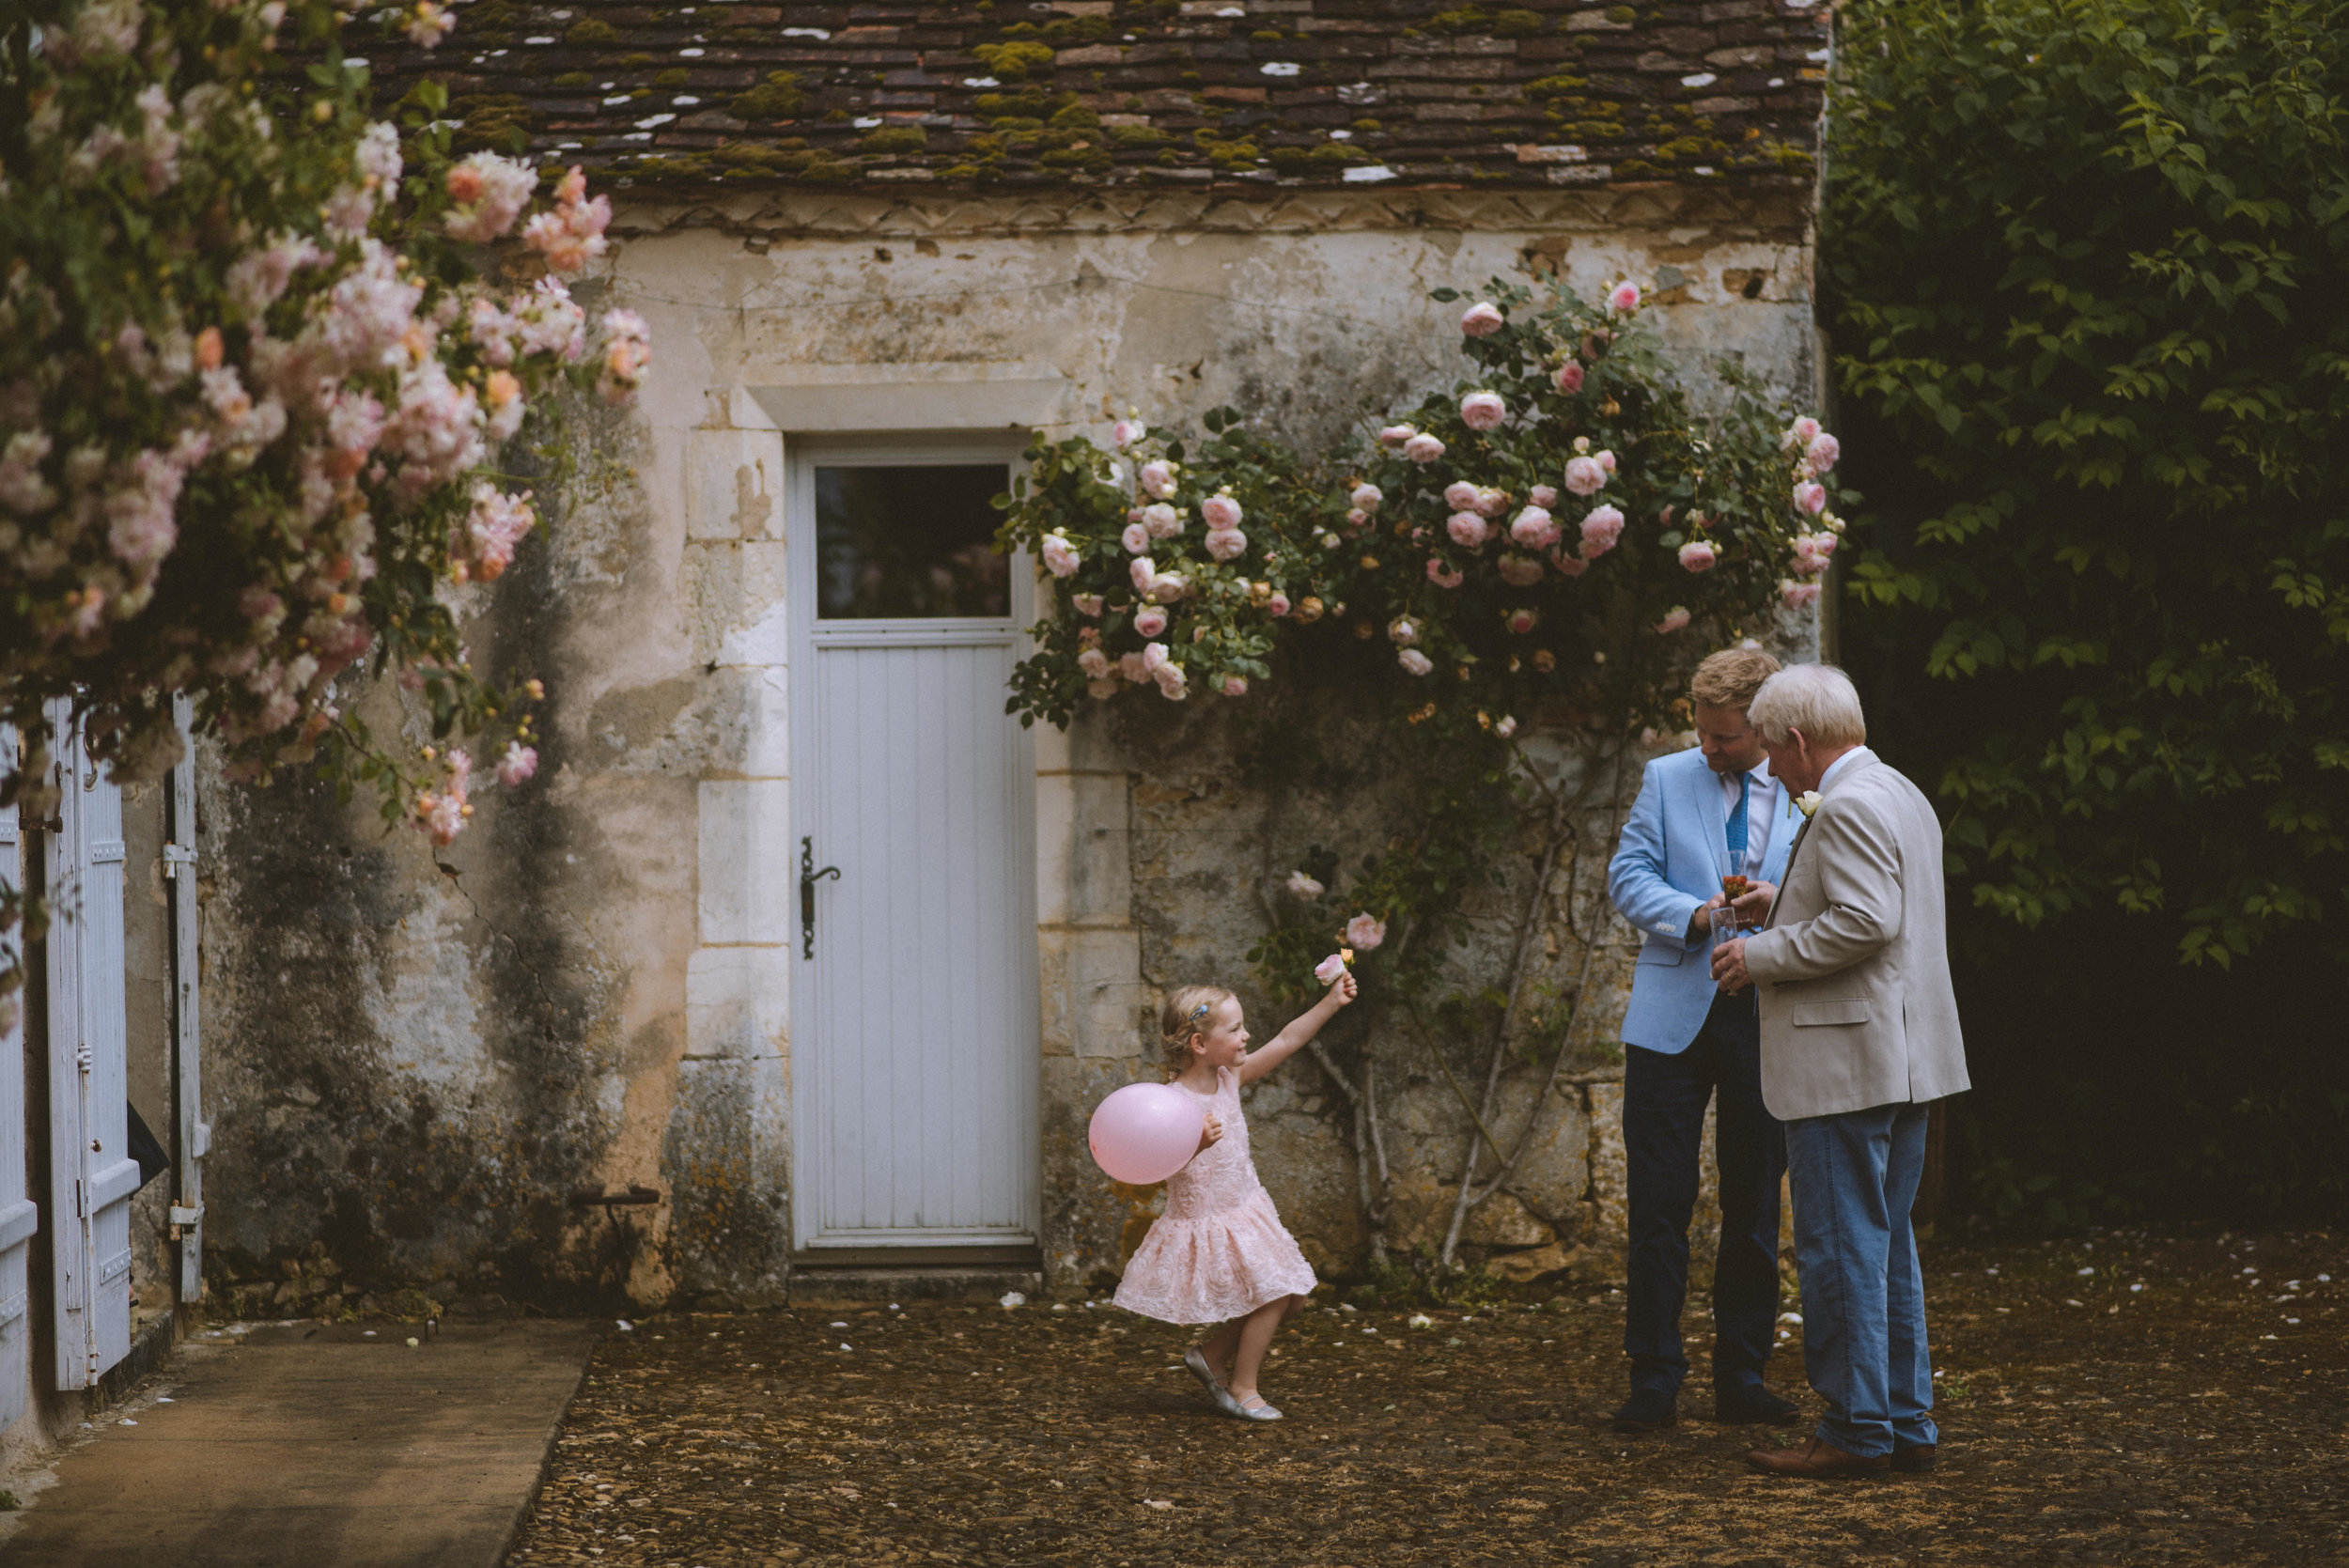 wedding-photographer-dordogne-mark-shaw-20.jpg